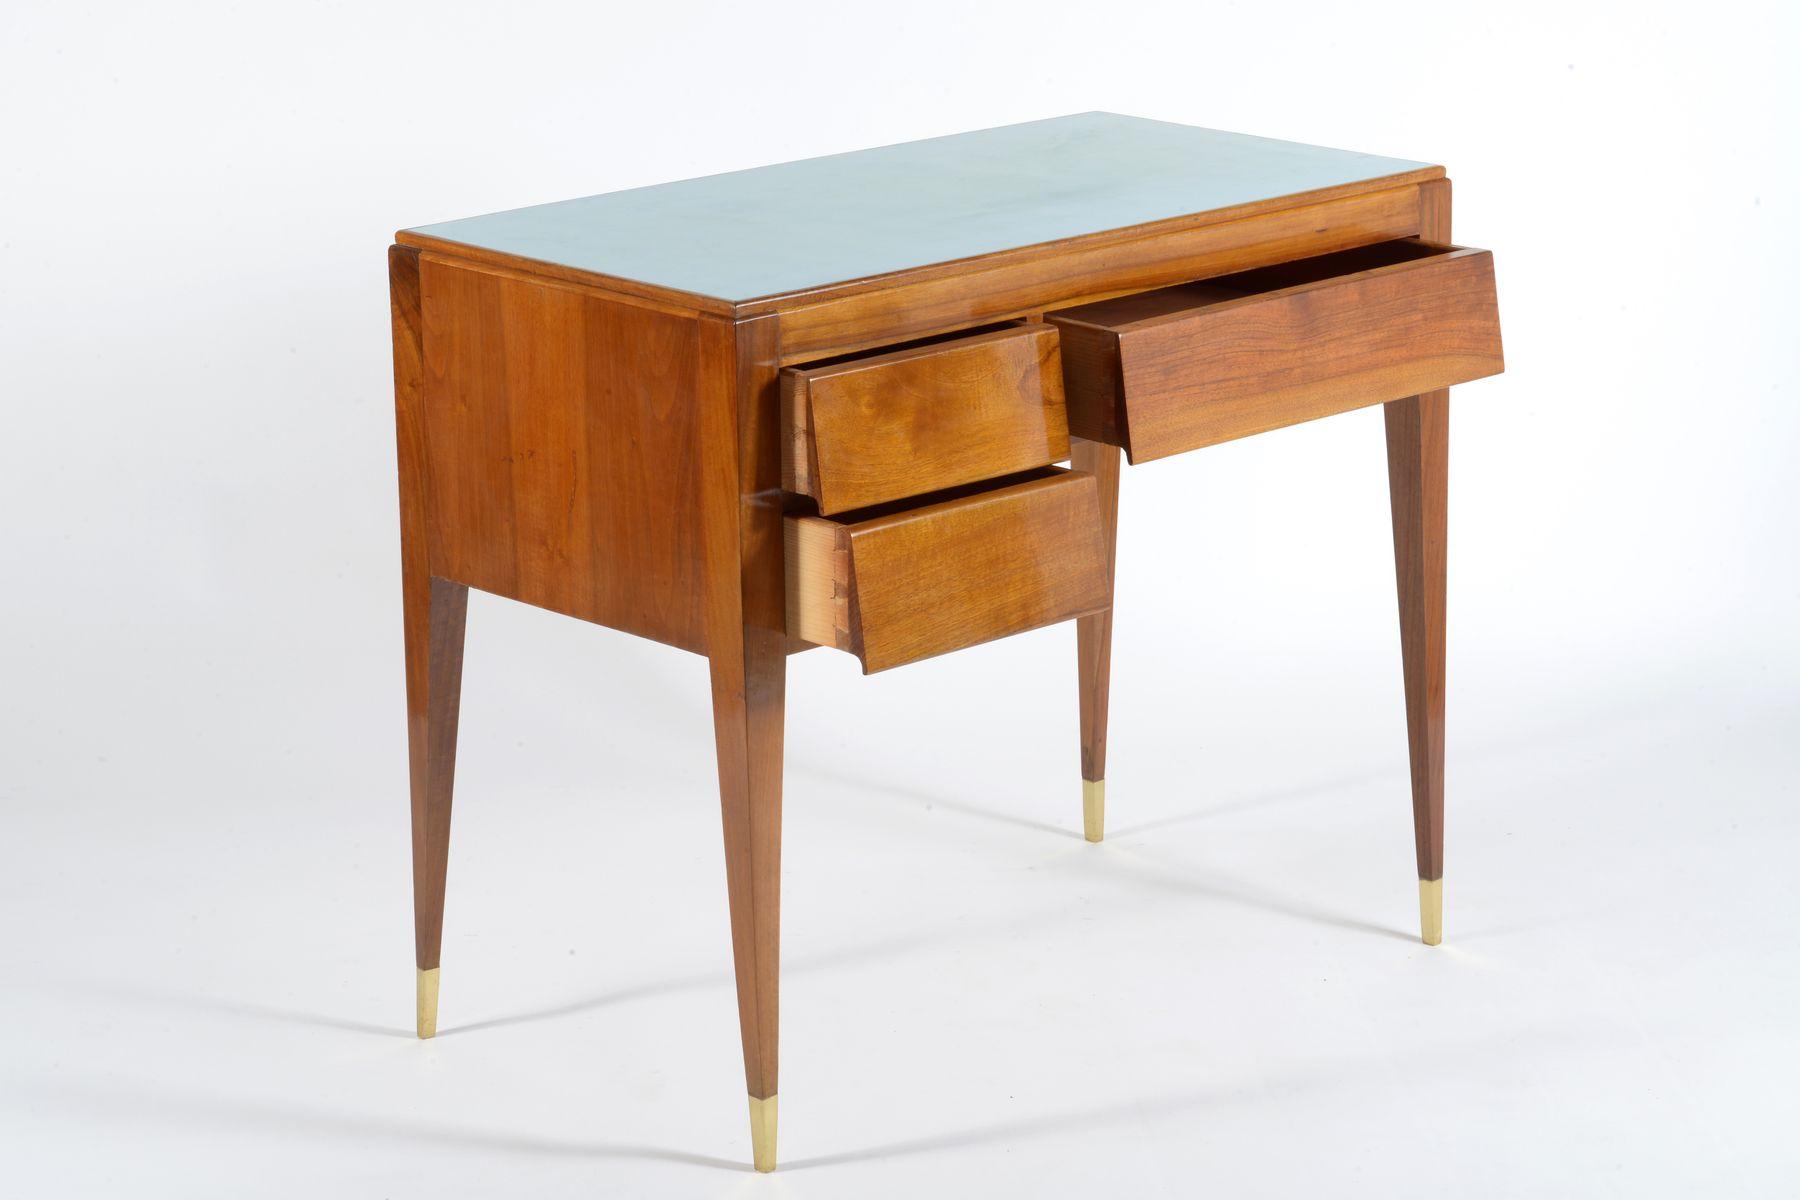 bureau mid century en noyer massif italie 1955 en vente. Black Bedroom Furniture Sets. Home Design Ideas